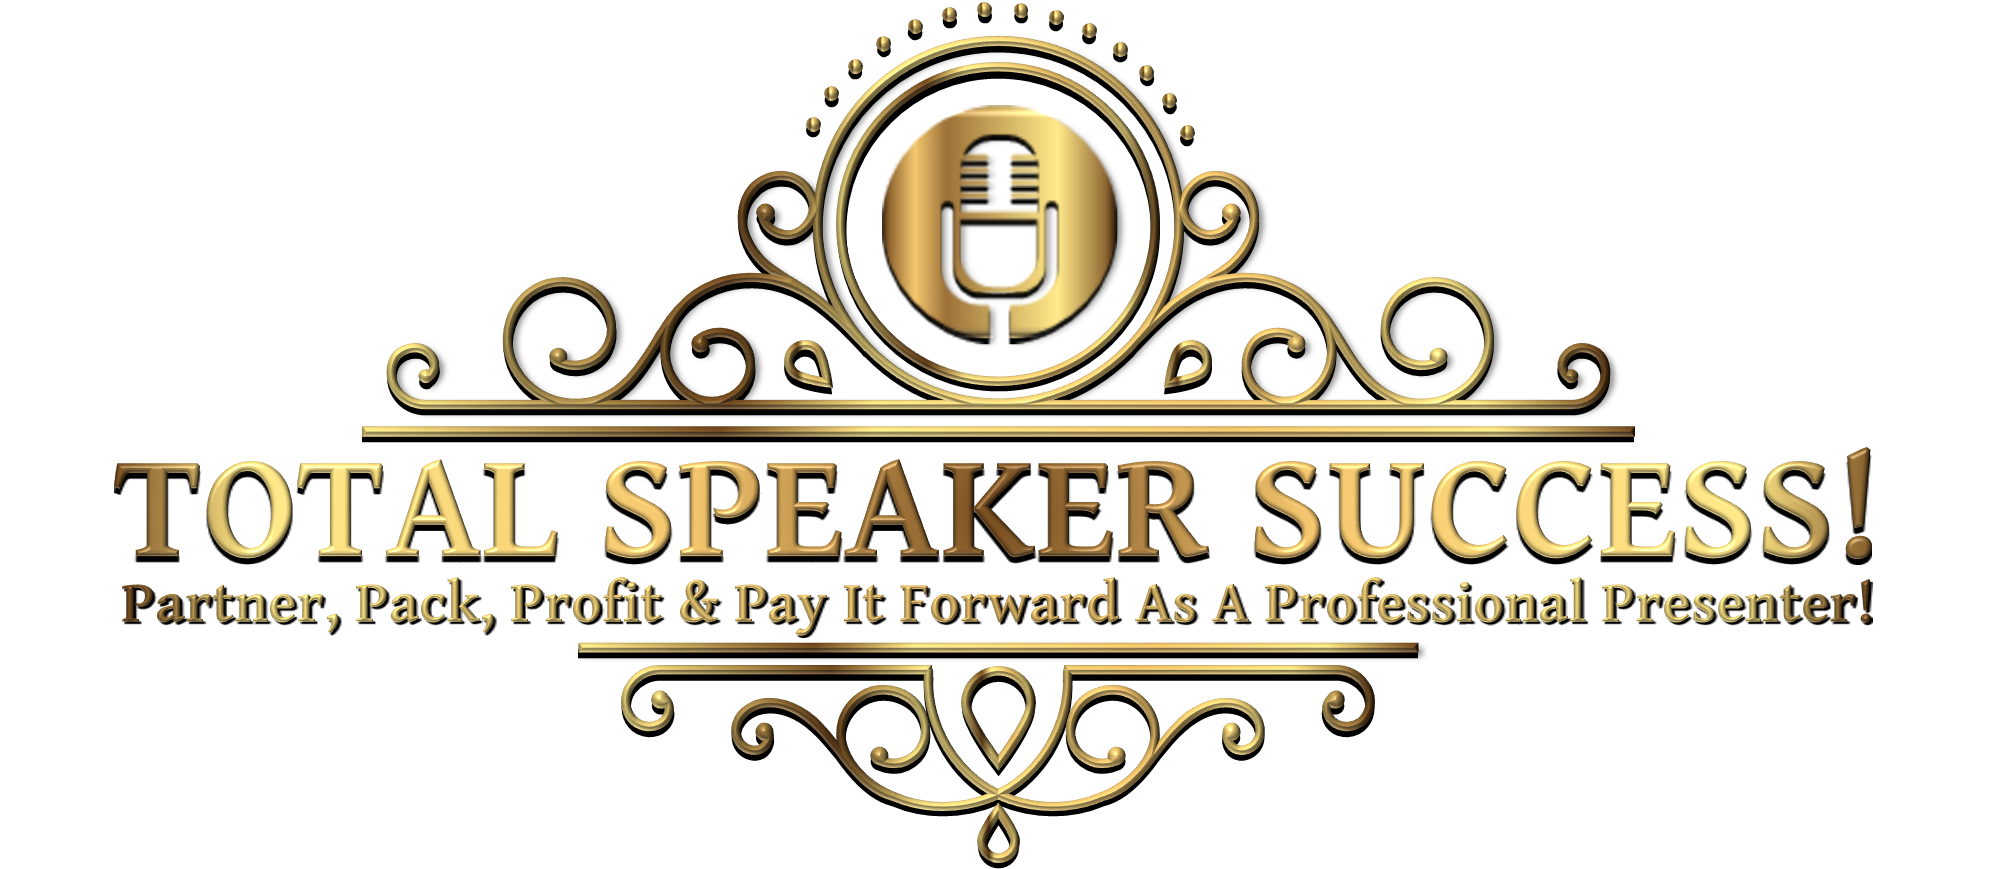 Total Speaker Success Header